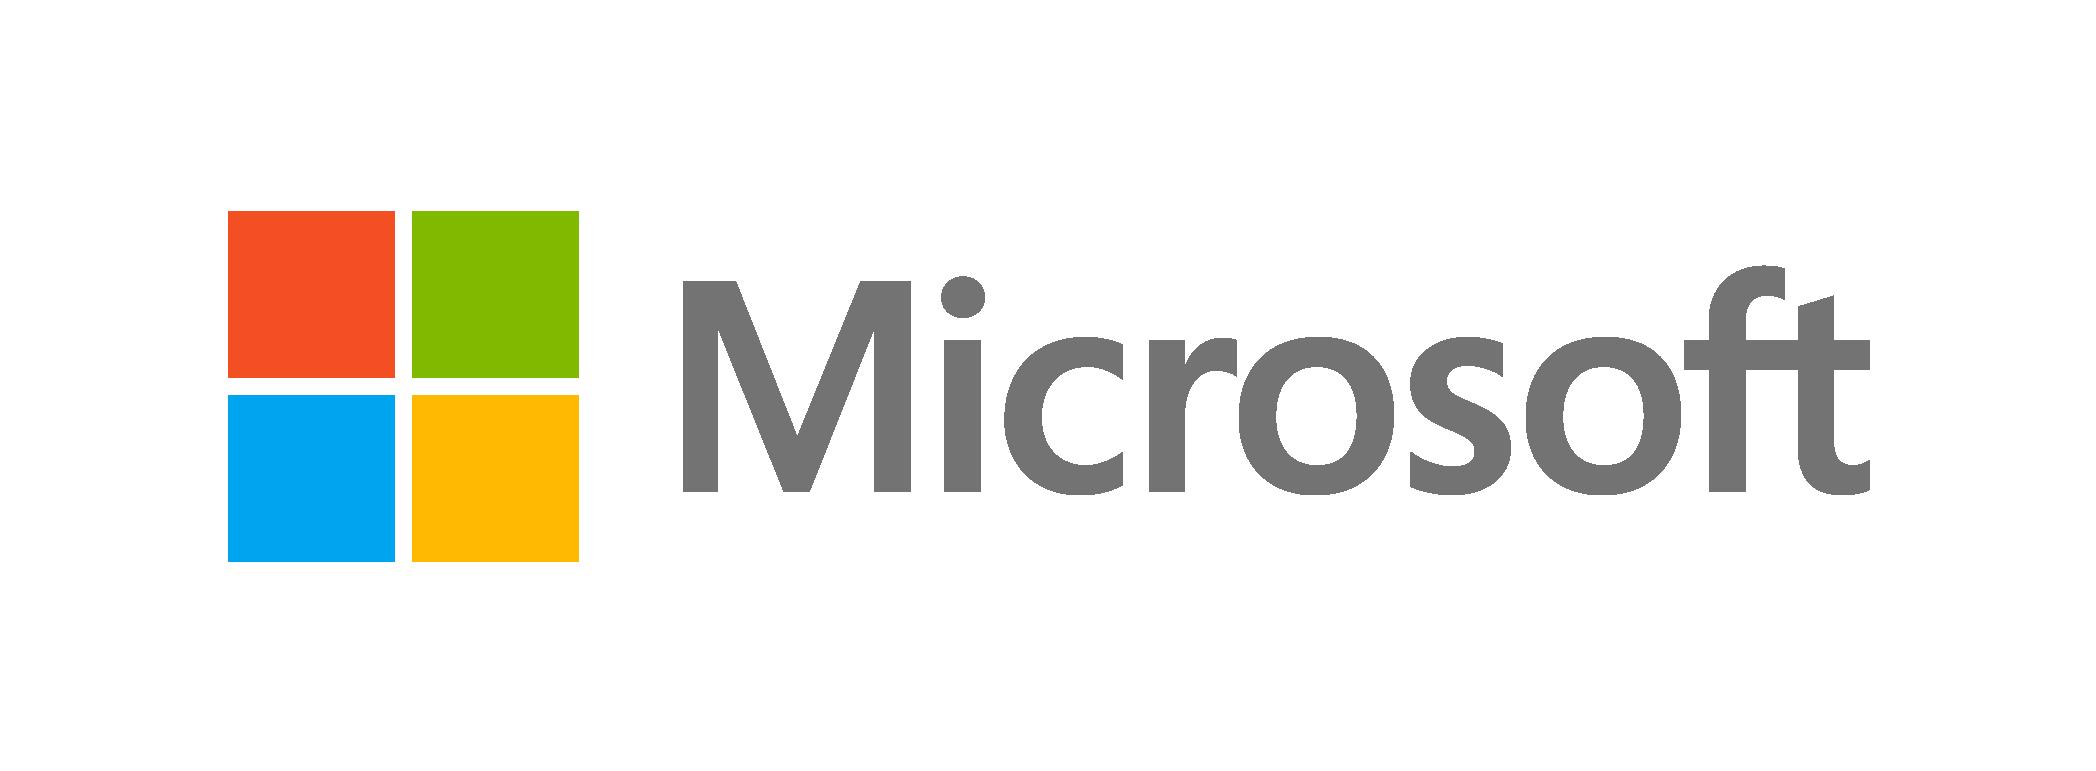 Microsoft Partner | Office 365 & Dynamics CRM